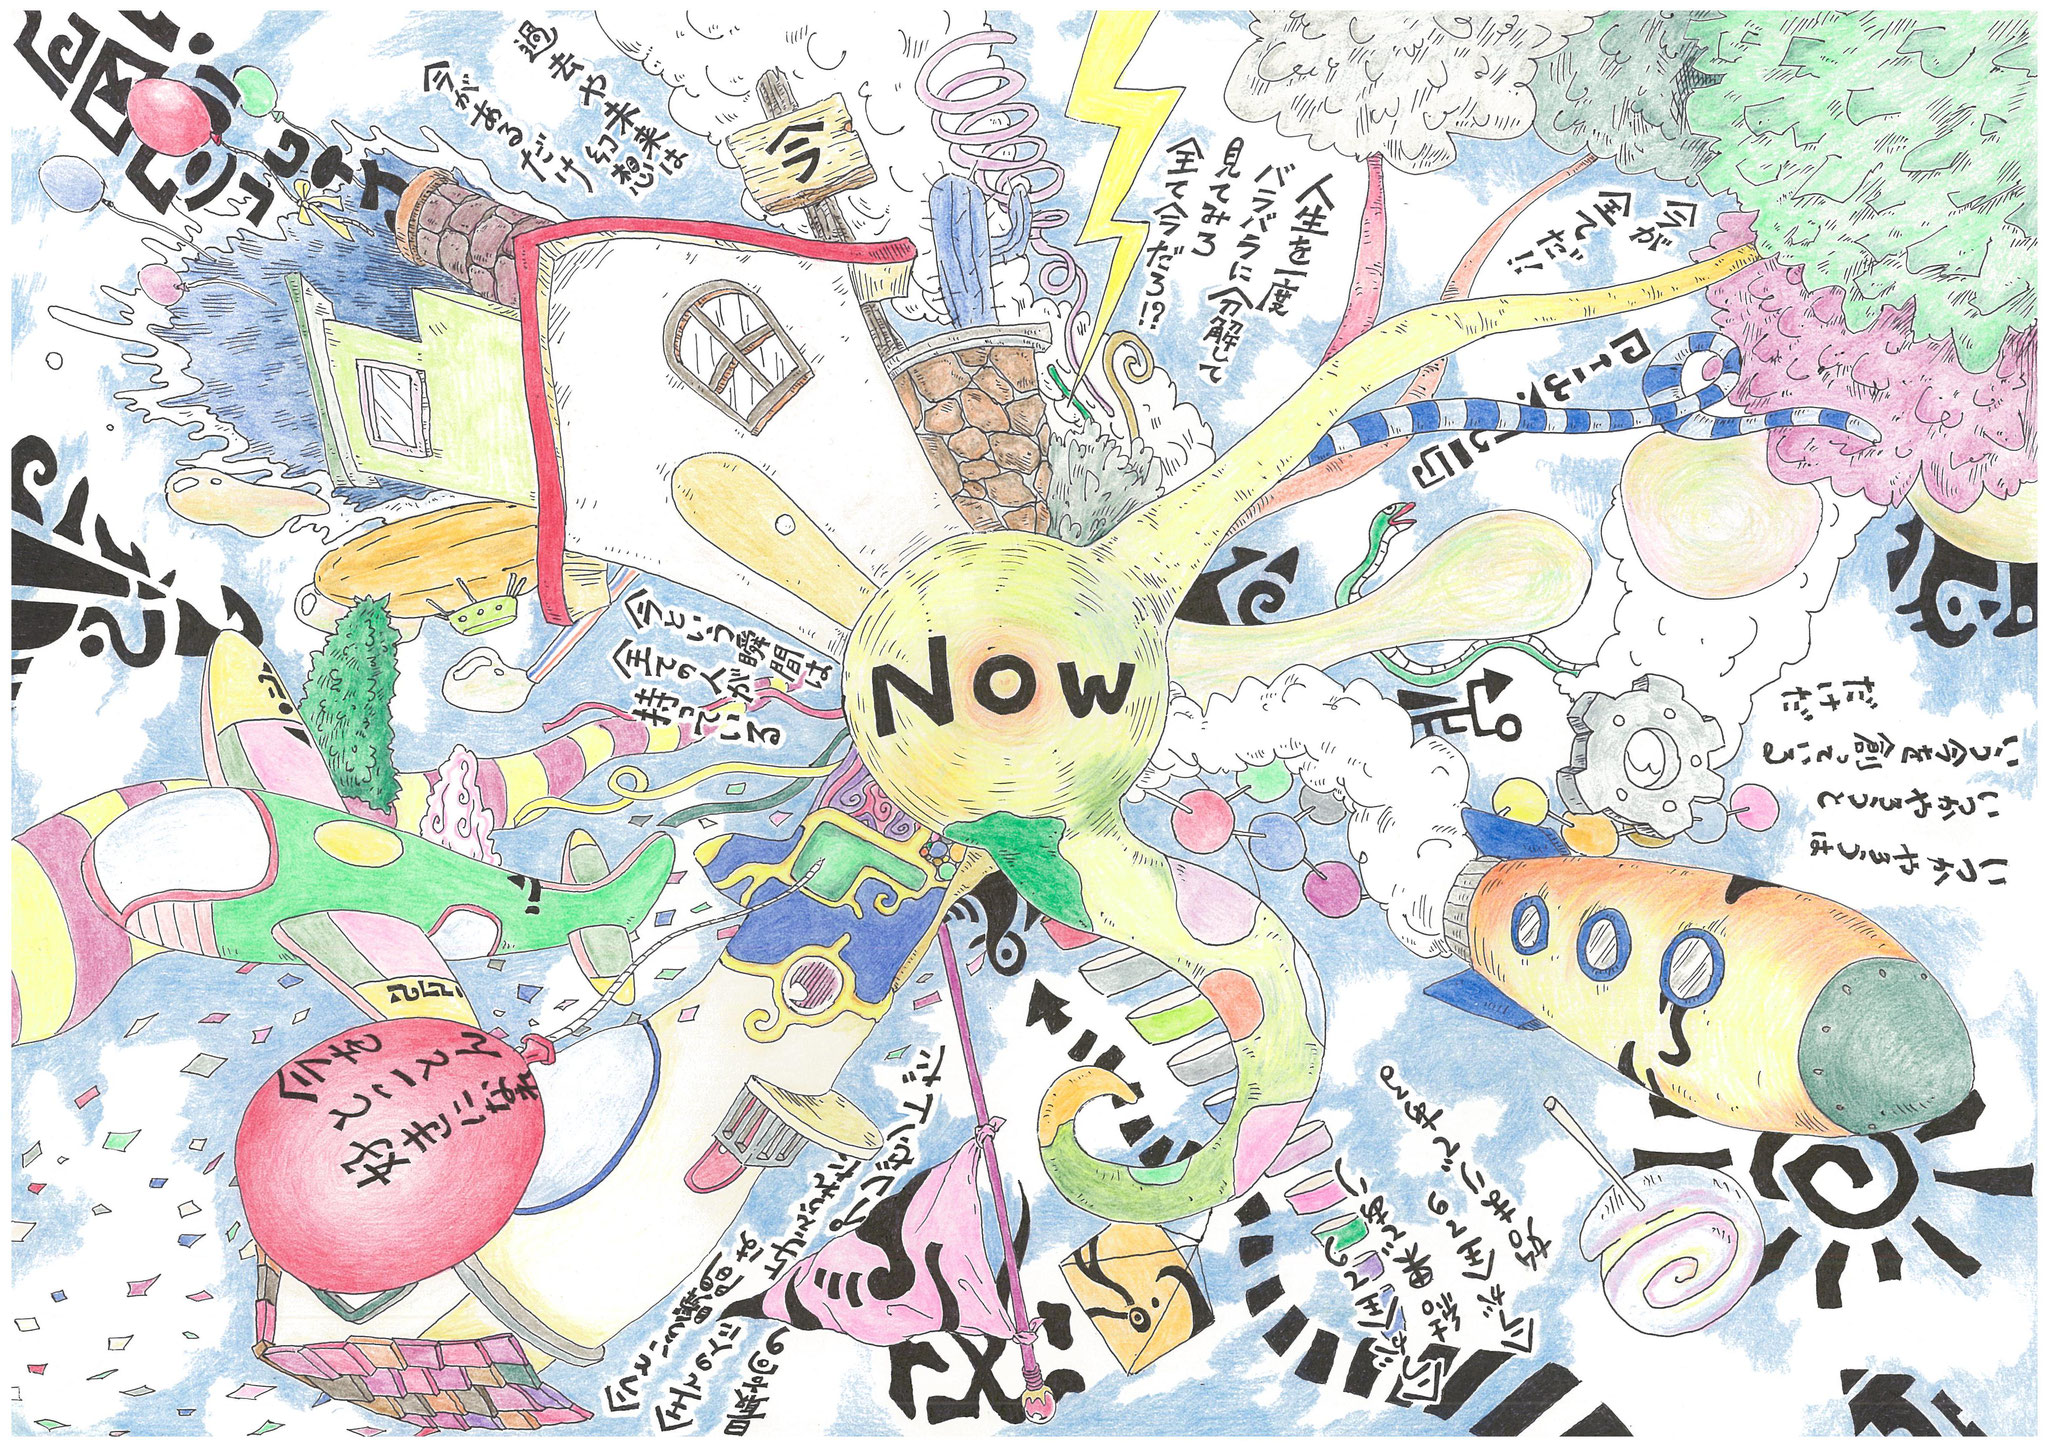 NOW・今。記憶力を簡単に上げる事ができる記憶術の根幹である 『 街(場所) 』 『 想像力(イメージ力) 』 を具現化する 『 アトリエきよし(吉村清:福岡の思想家・漫画家・イラストレーター) 』 氏 作品。